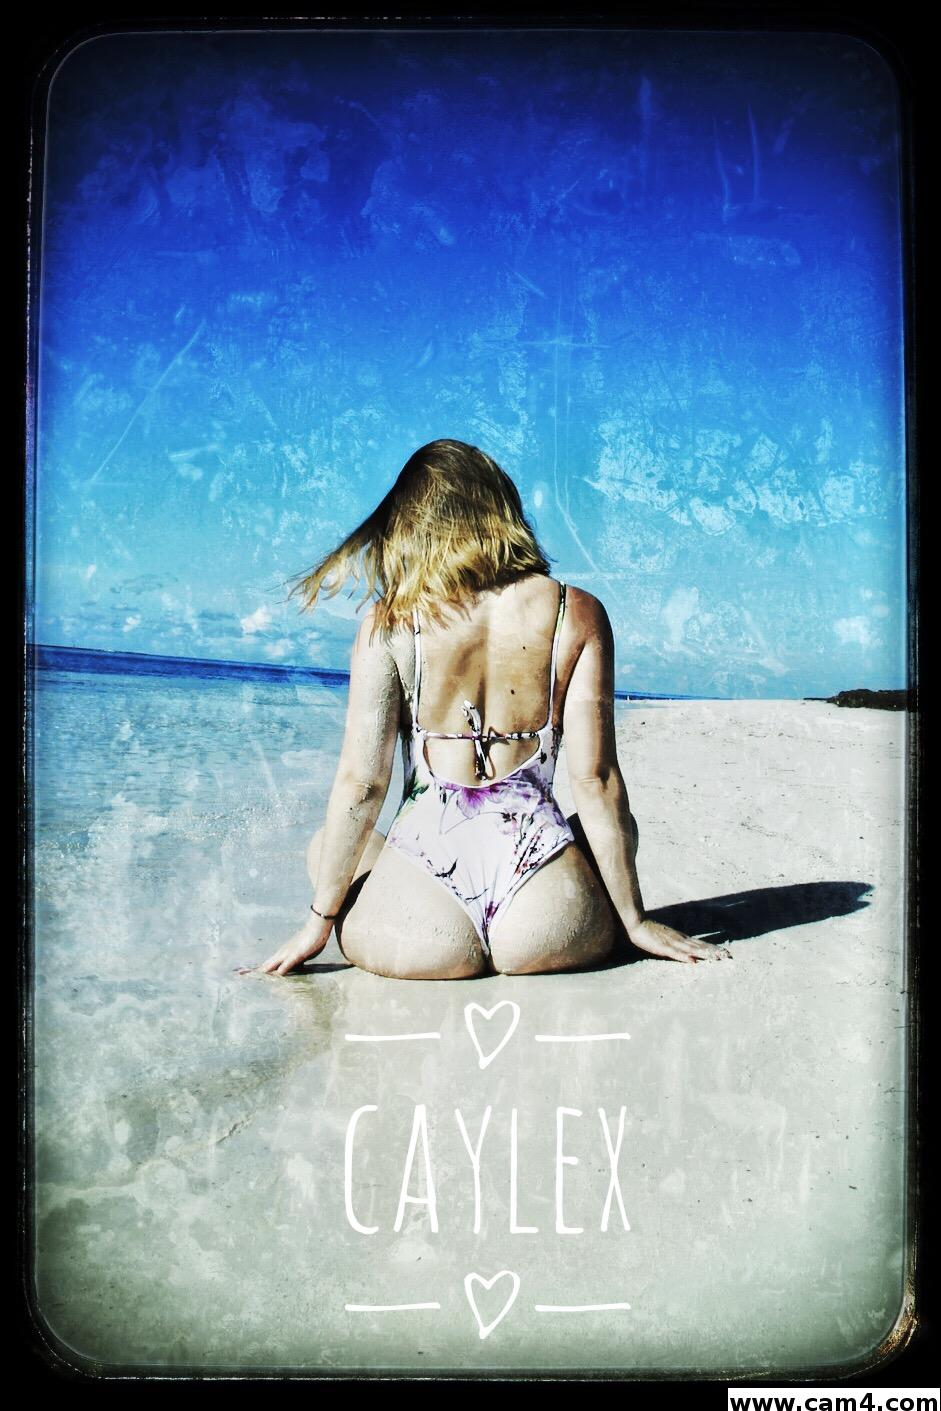 Caylex1?s=6n0xlllvpff7kfjw2wdgpn2h8re2i0ffr3xz1zhw4wi=